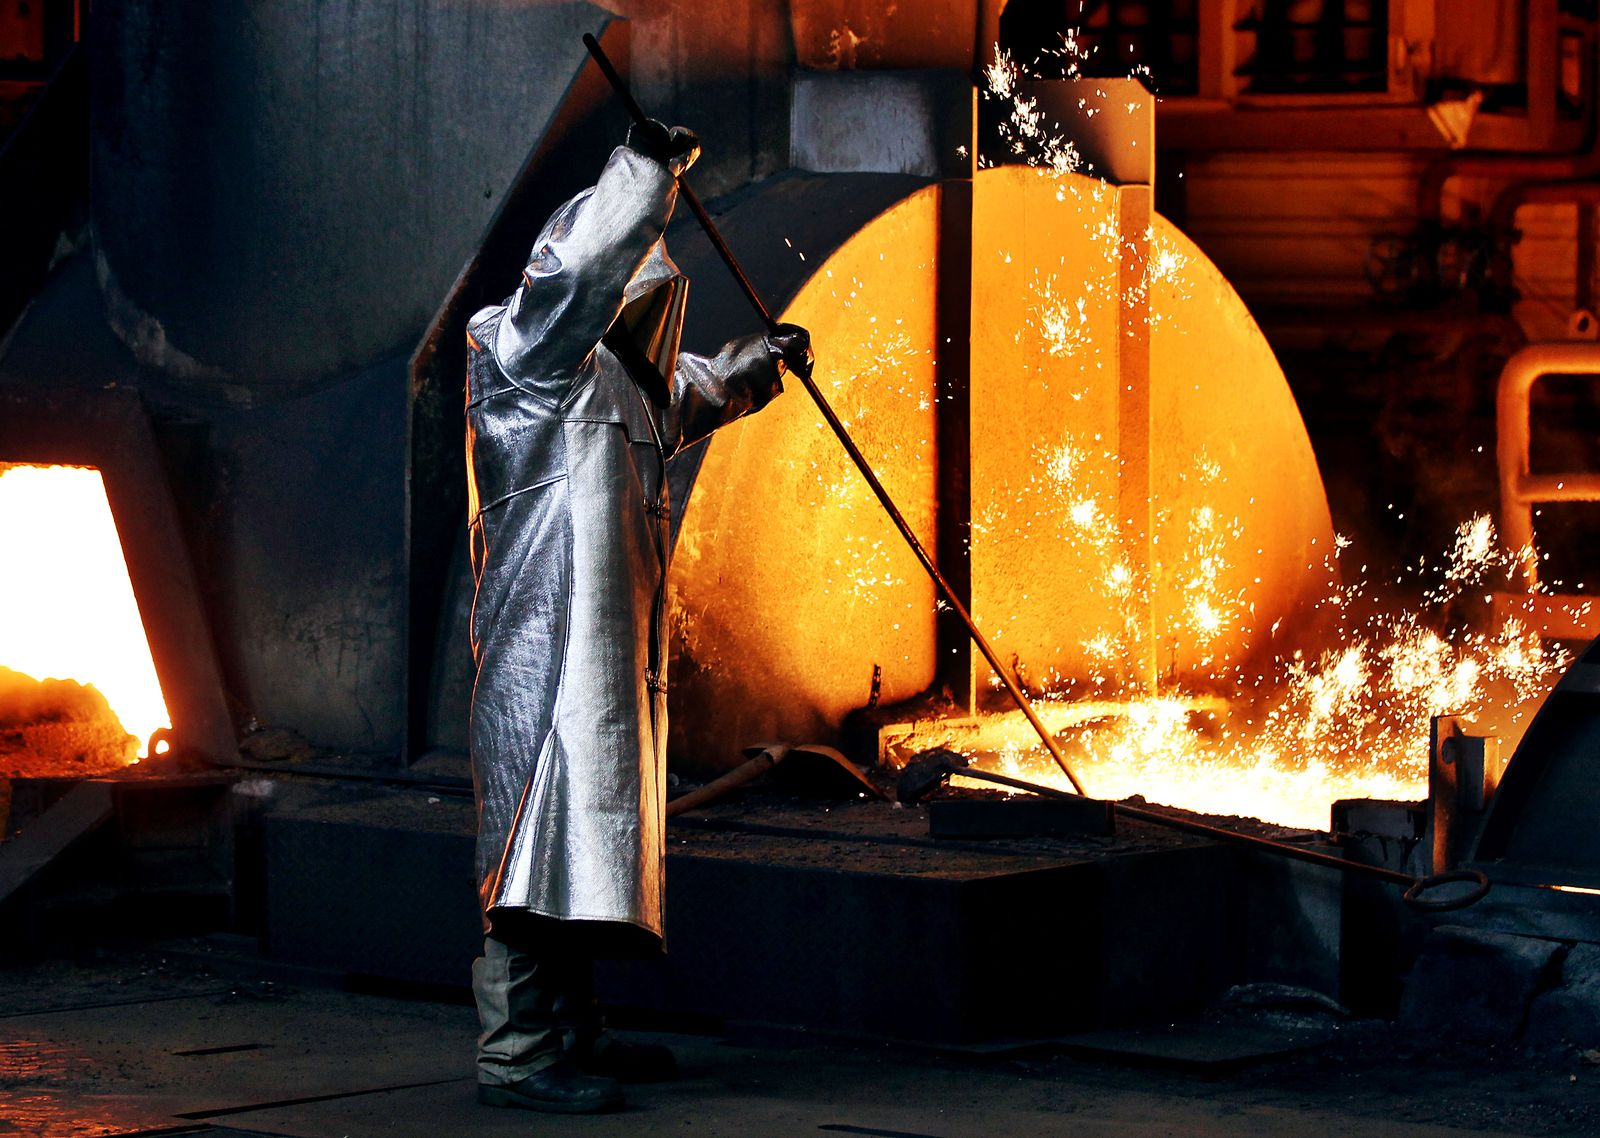 Thyssenkrupp - Stahlproduktion / Metall / Flüssig /